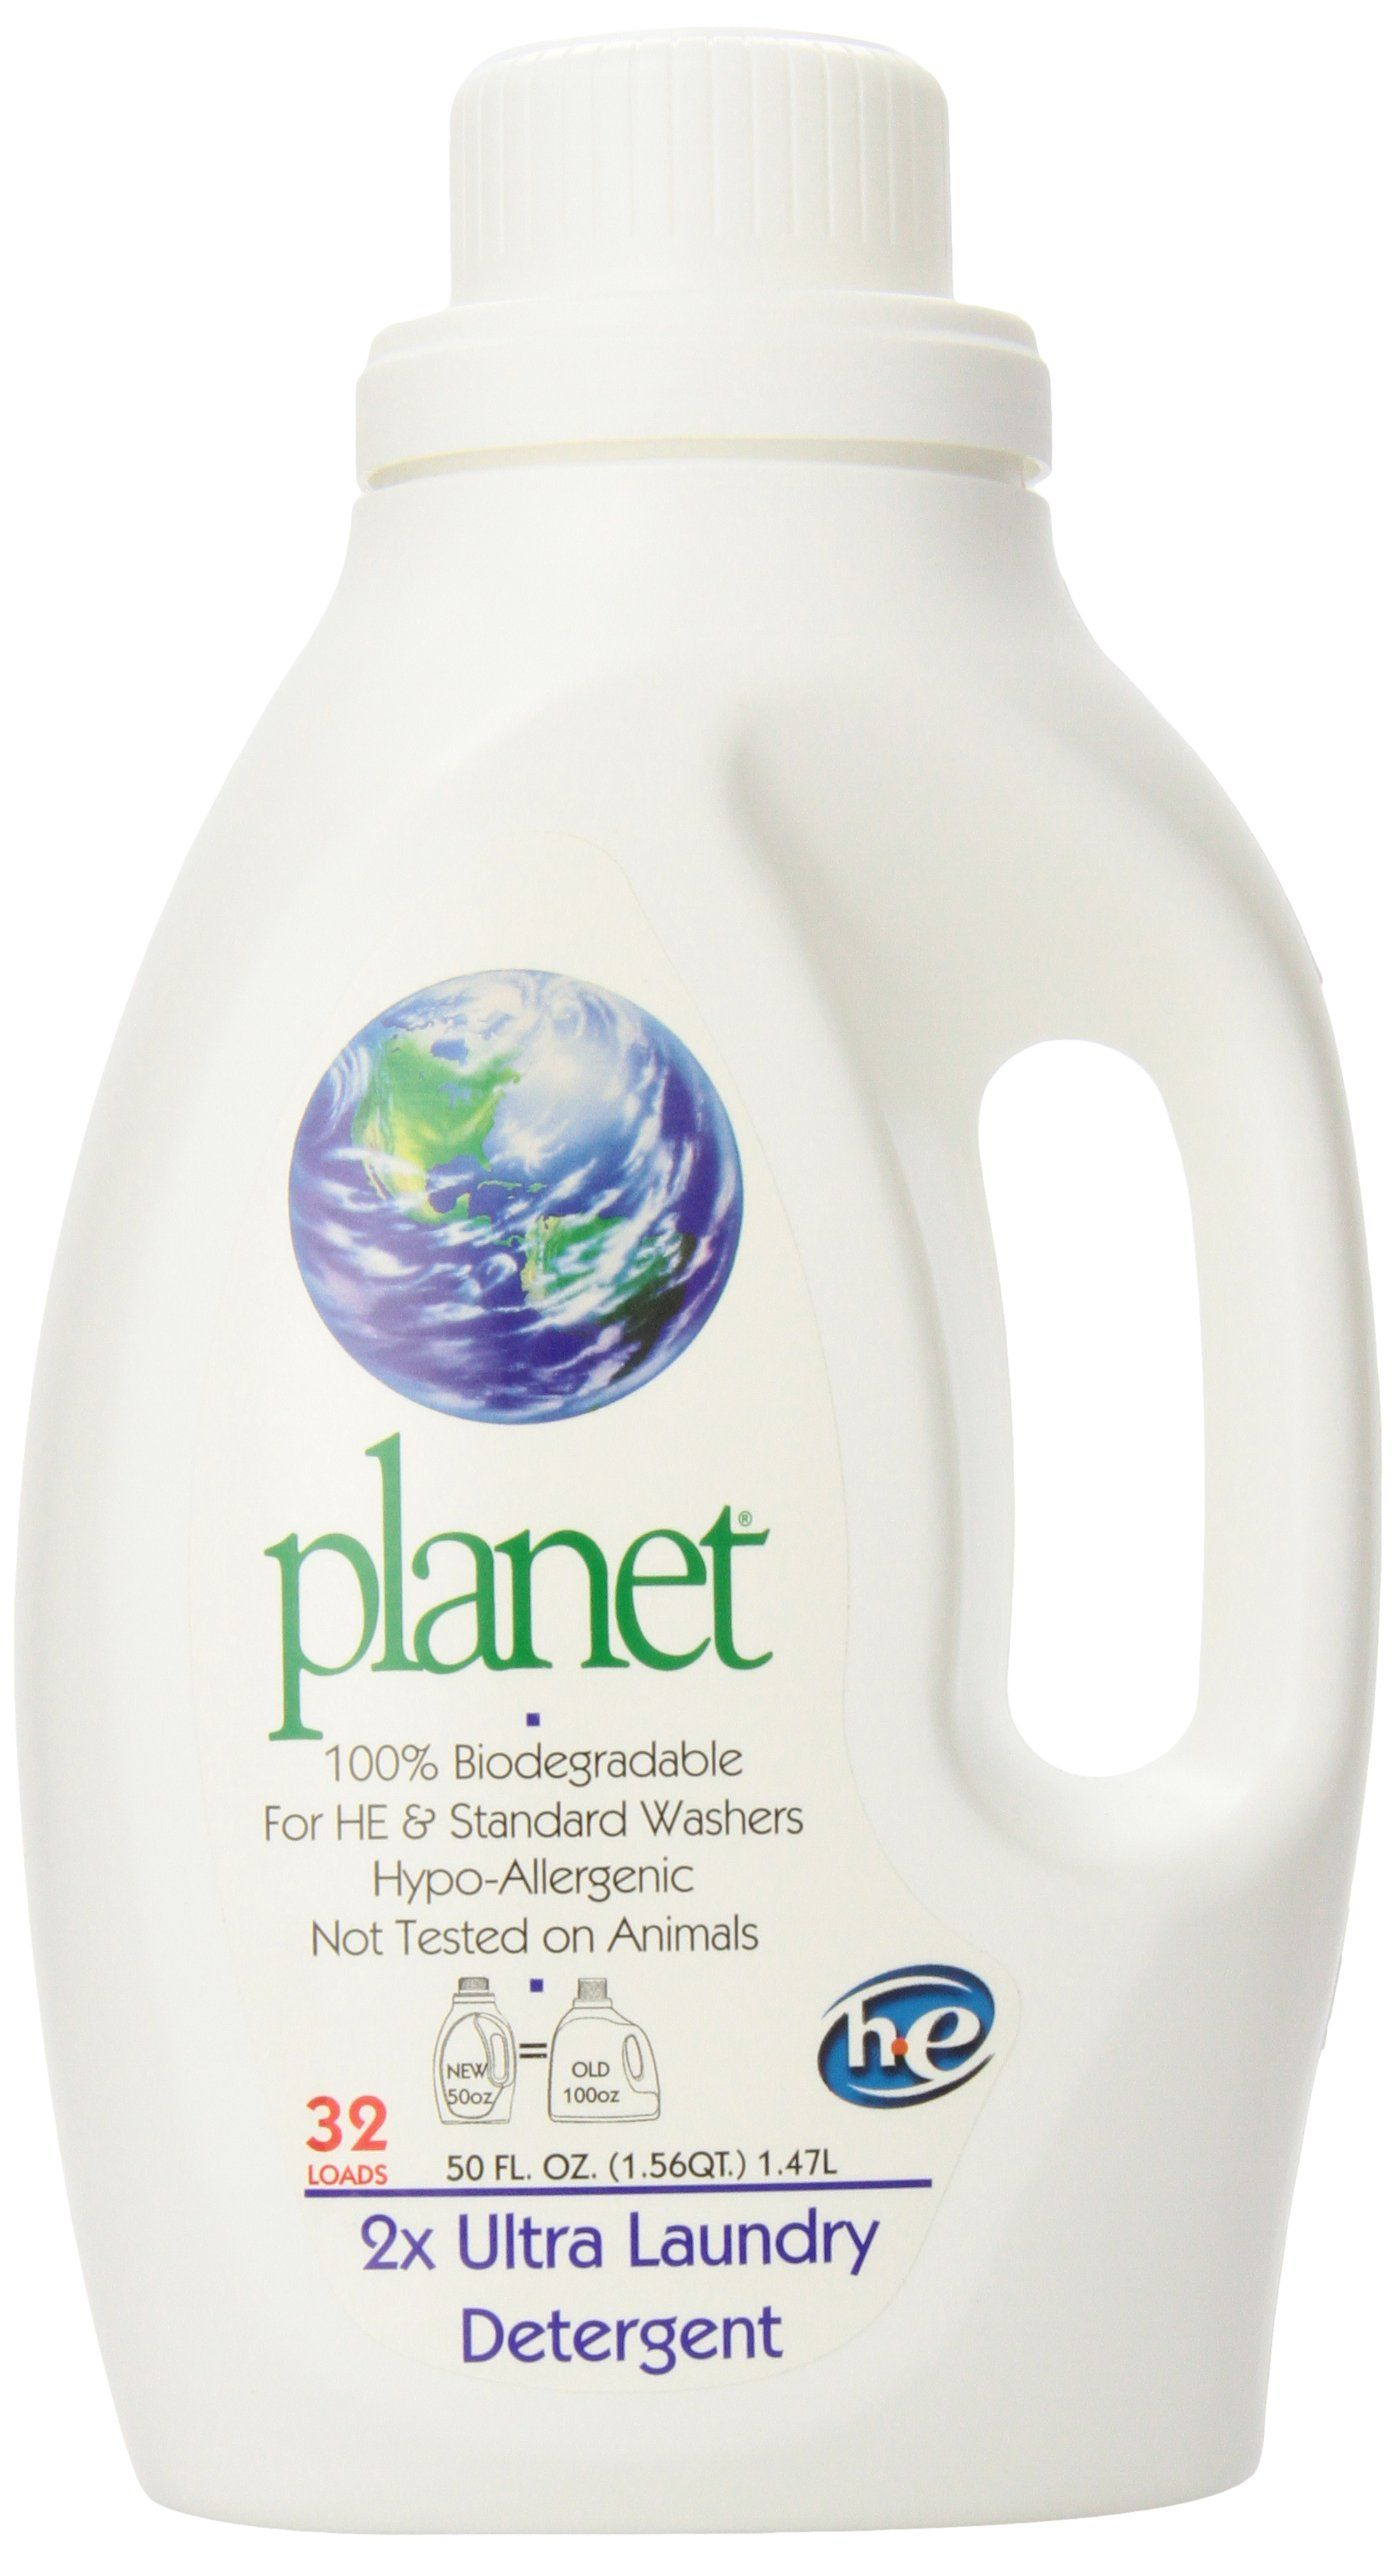 Robot Check Biodegradable Laundry Detergent Laundry Liquid Laundry Detergent